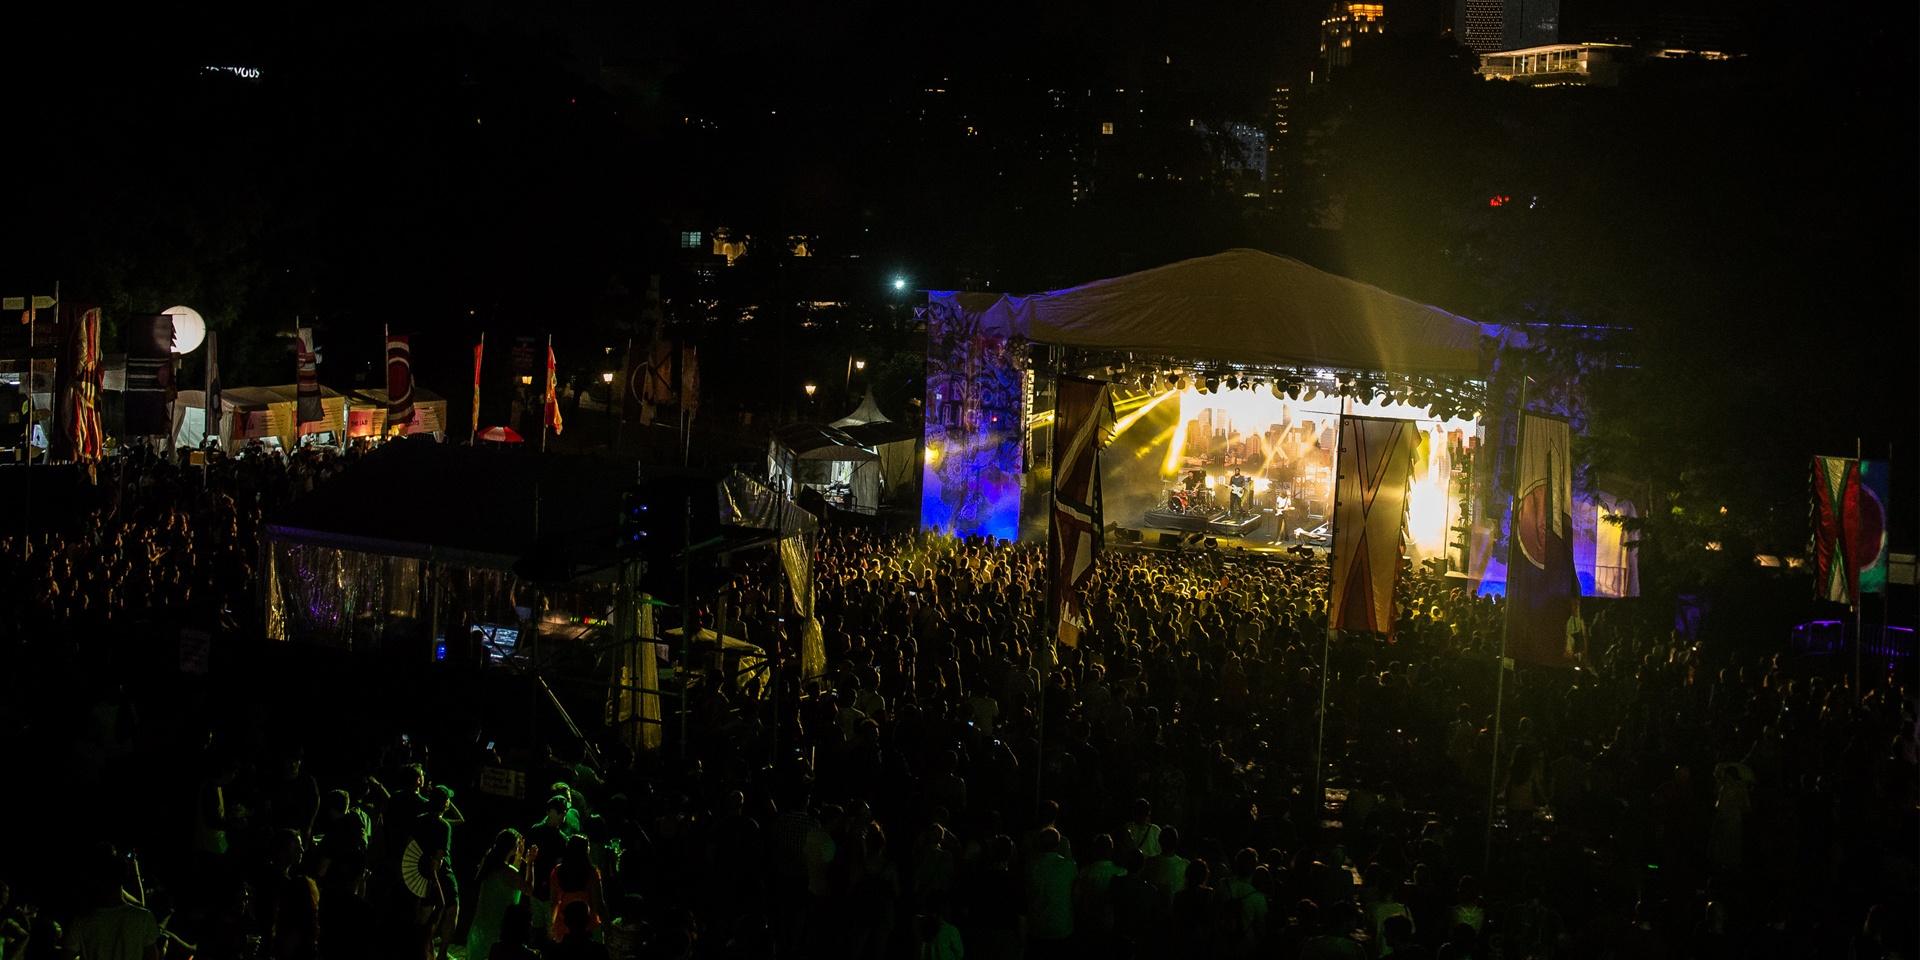 Neon Lights Festival will not be returning in 2017